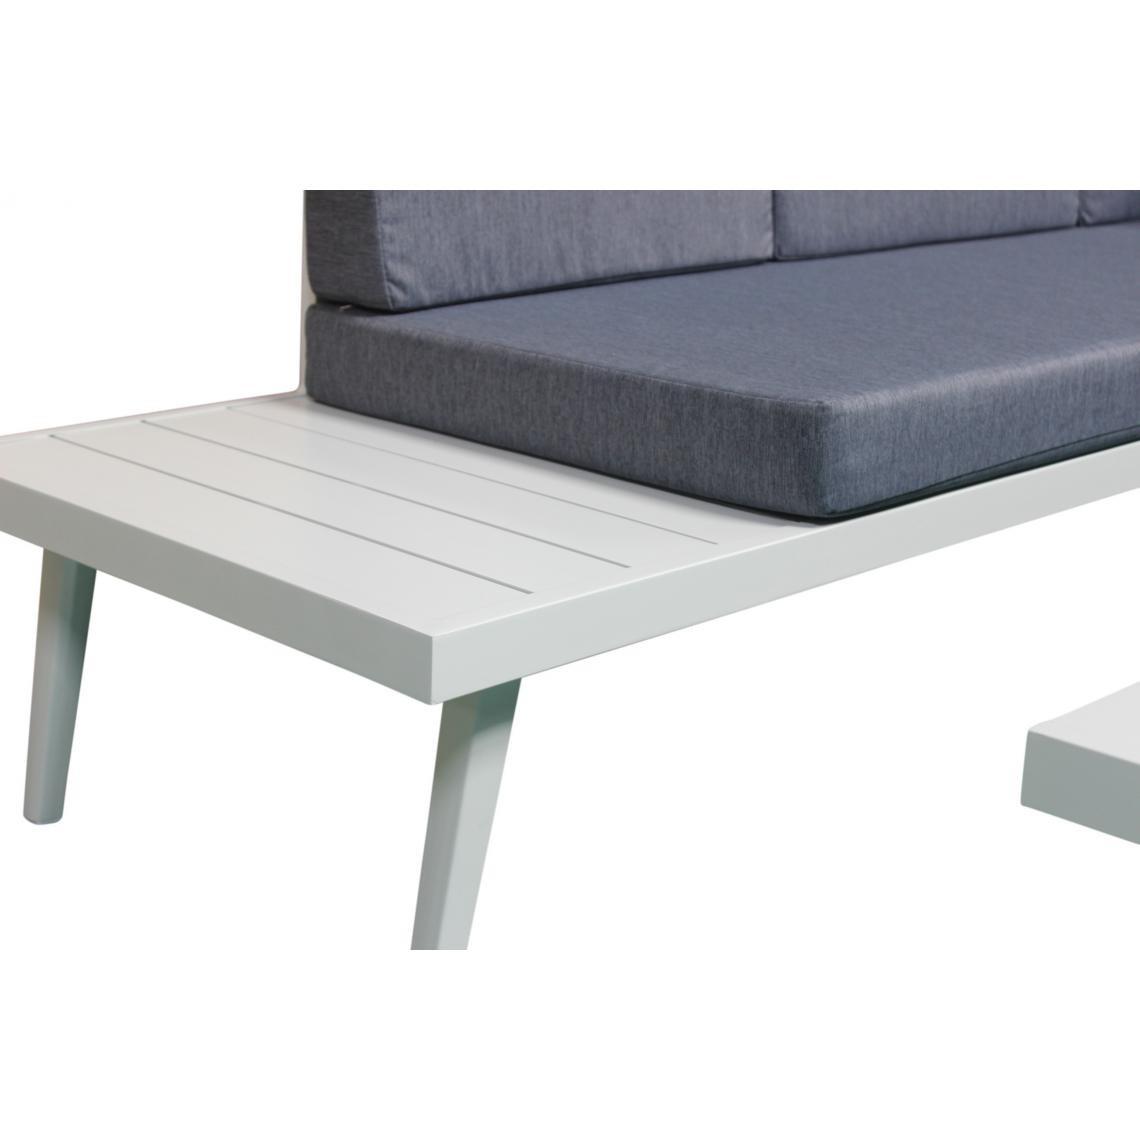 Salon de Jardin En Aluminium Blanc et Bleu ANASTASIA | 3 SUISSES